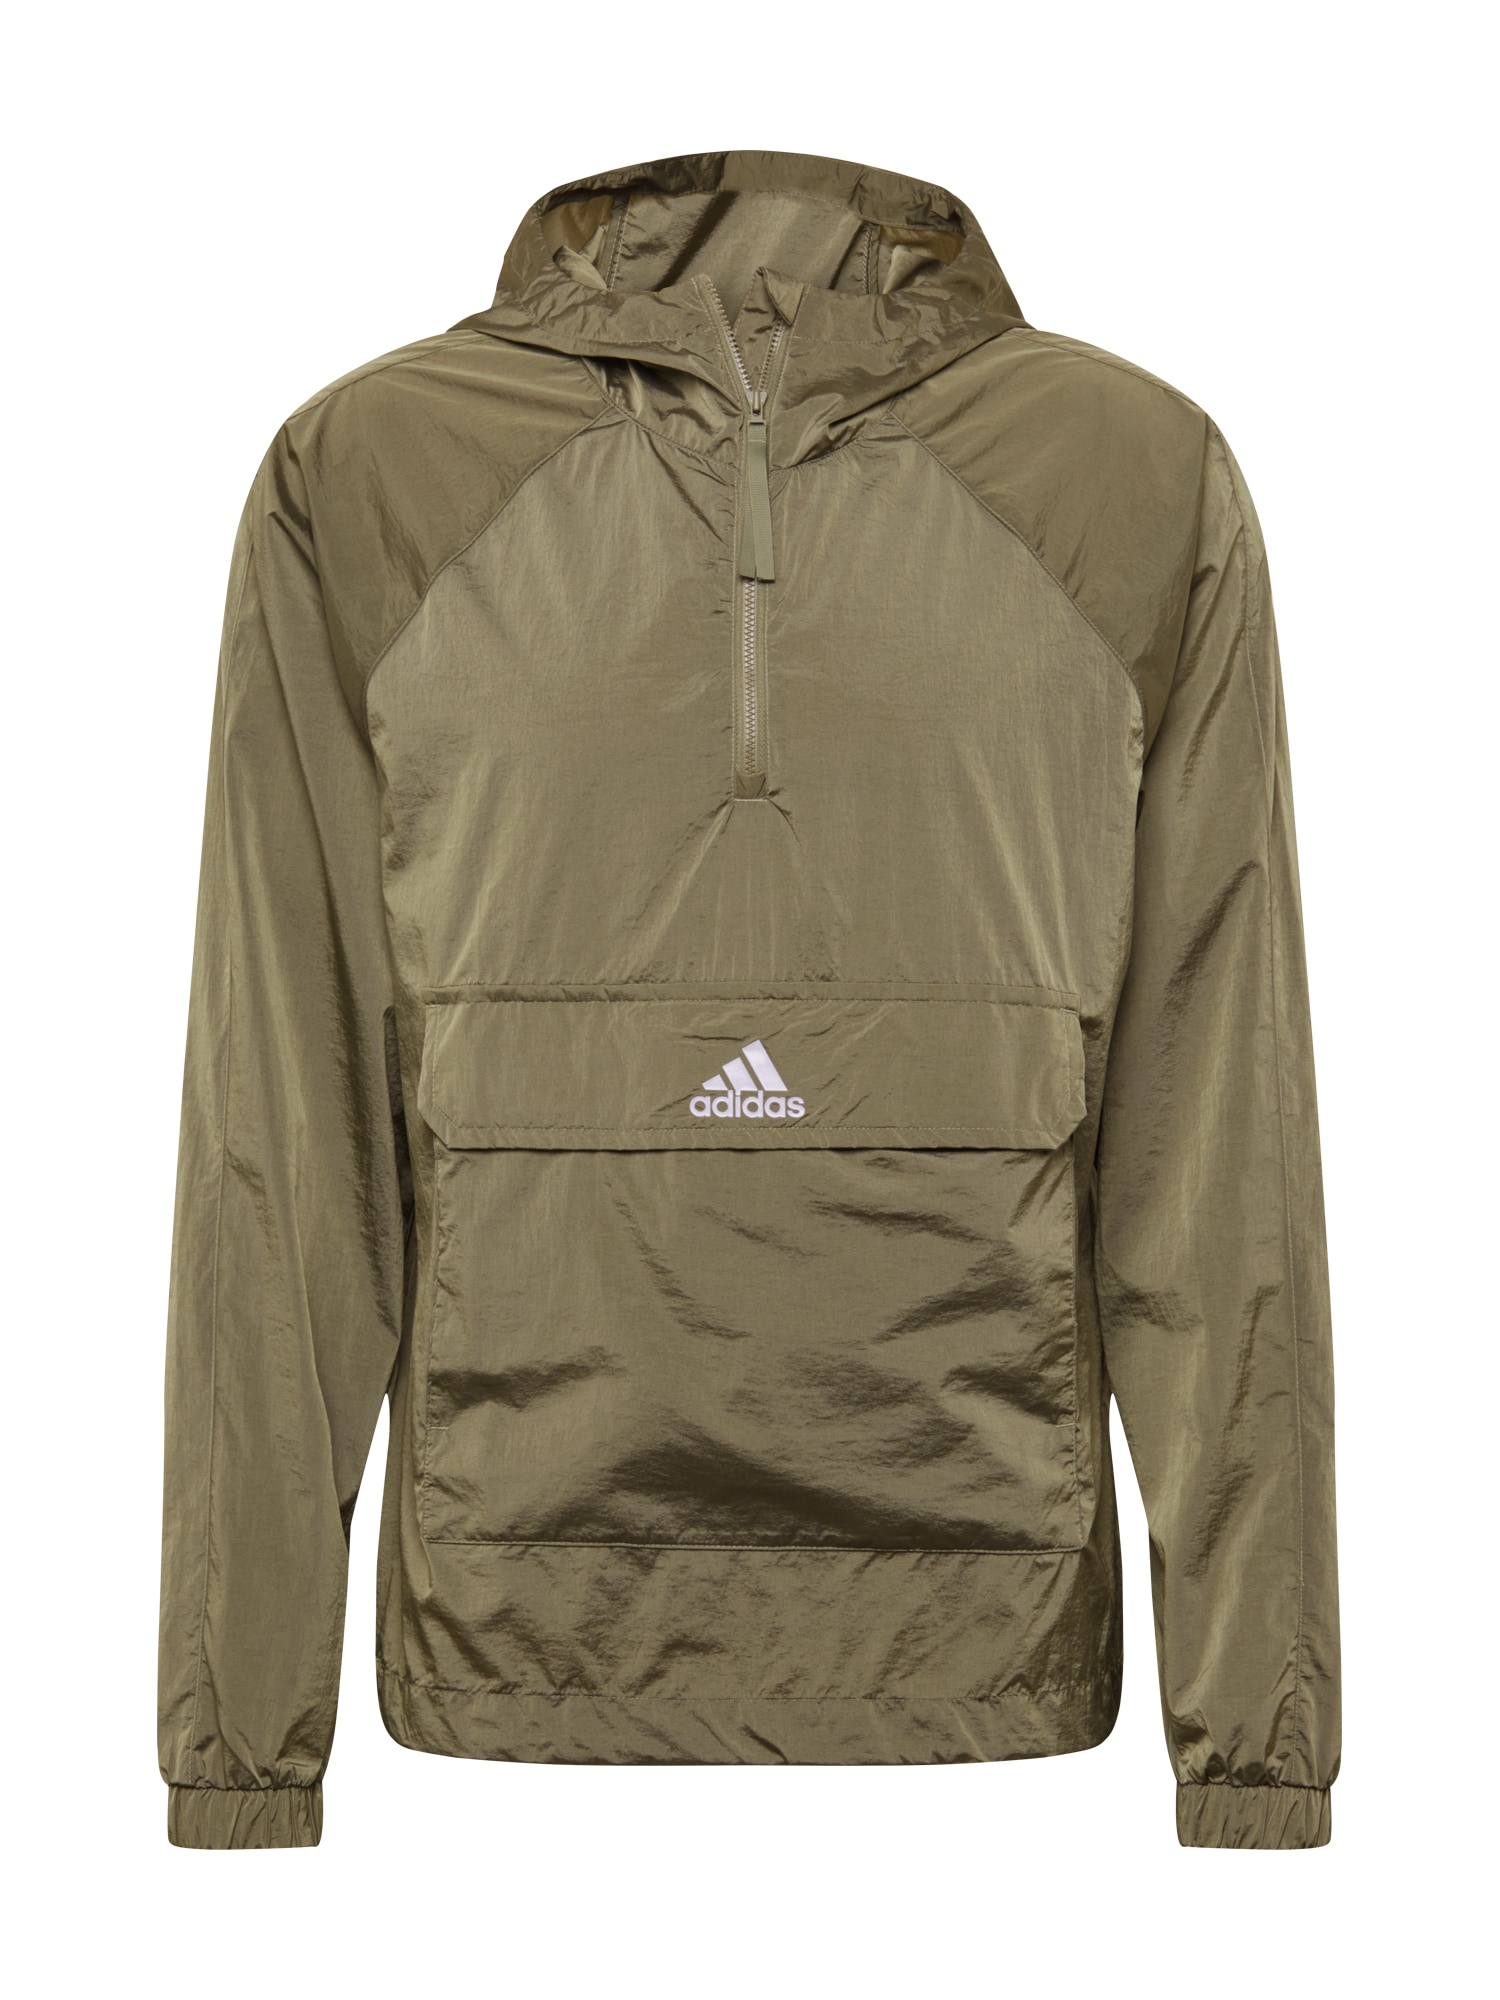 ADIDAS PERFORMANCE Sportovní bunda  khaki / bílá